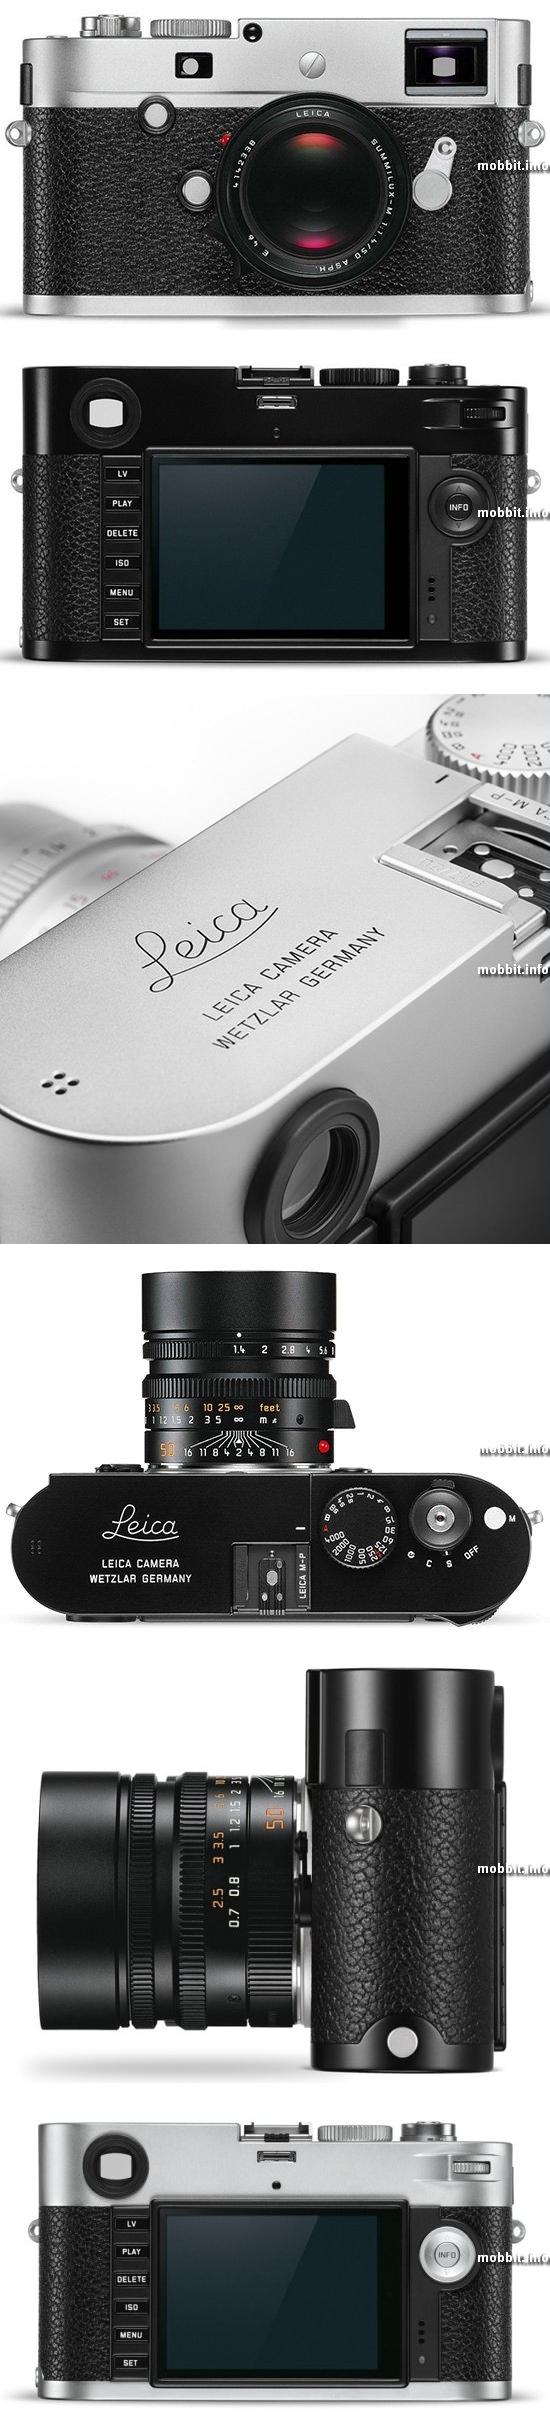 Leica M-P 240